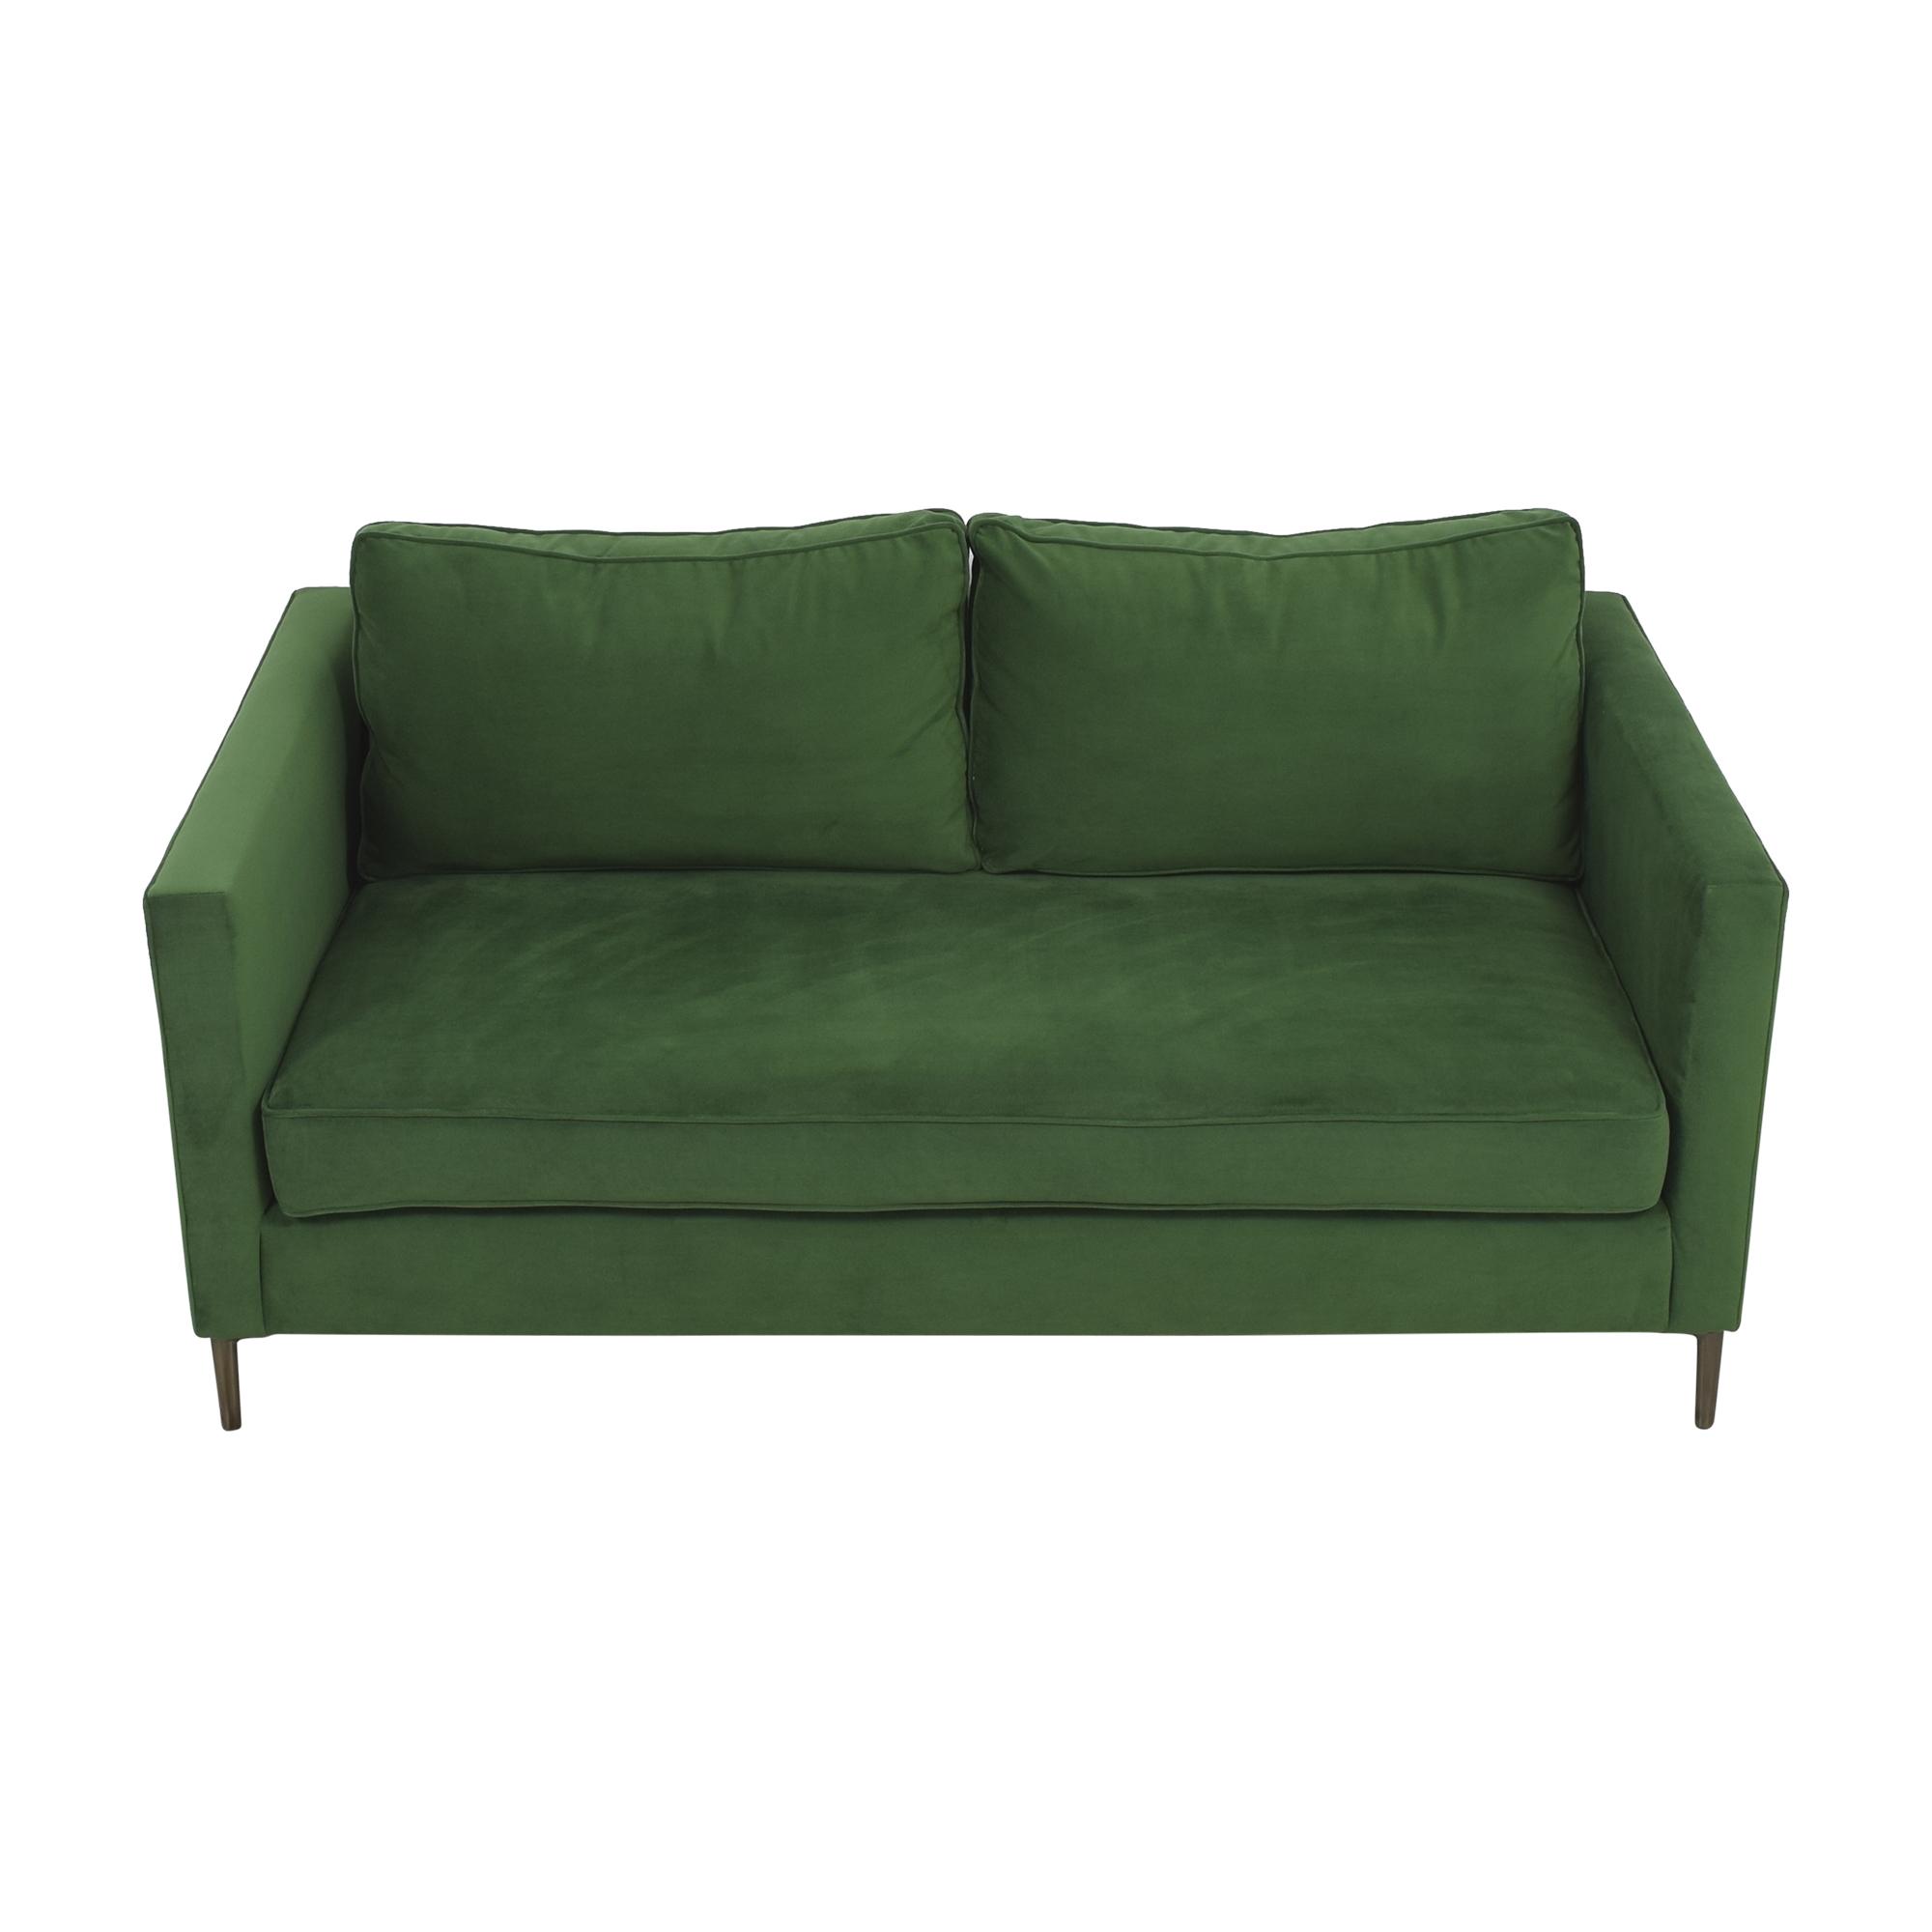 West Elm West Elm Harris Loft Sofa green